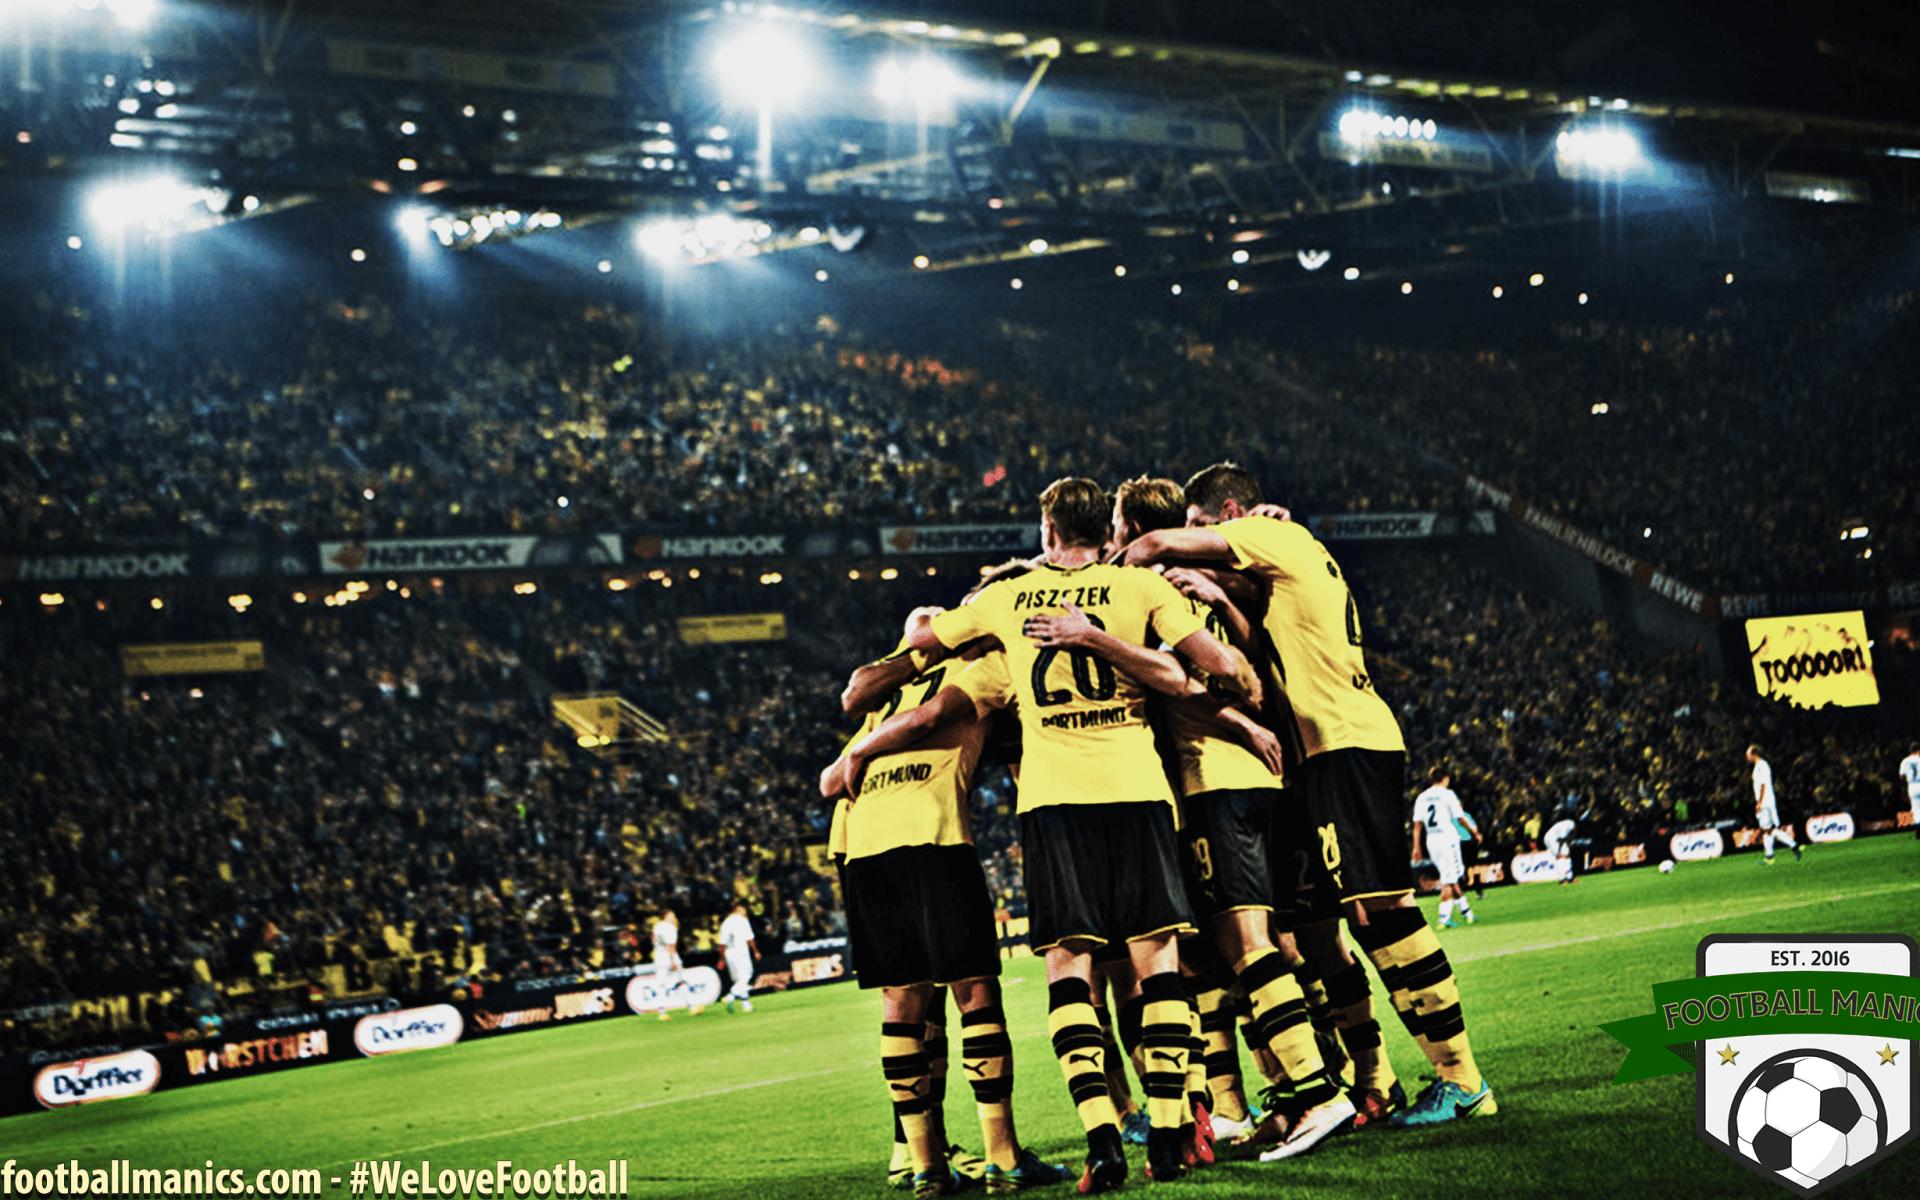 Borussia Dortmund Wallpapers Top Free Borussia Dortmund Backgrounds Wallpaperaccess